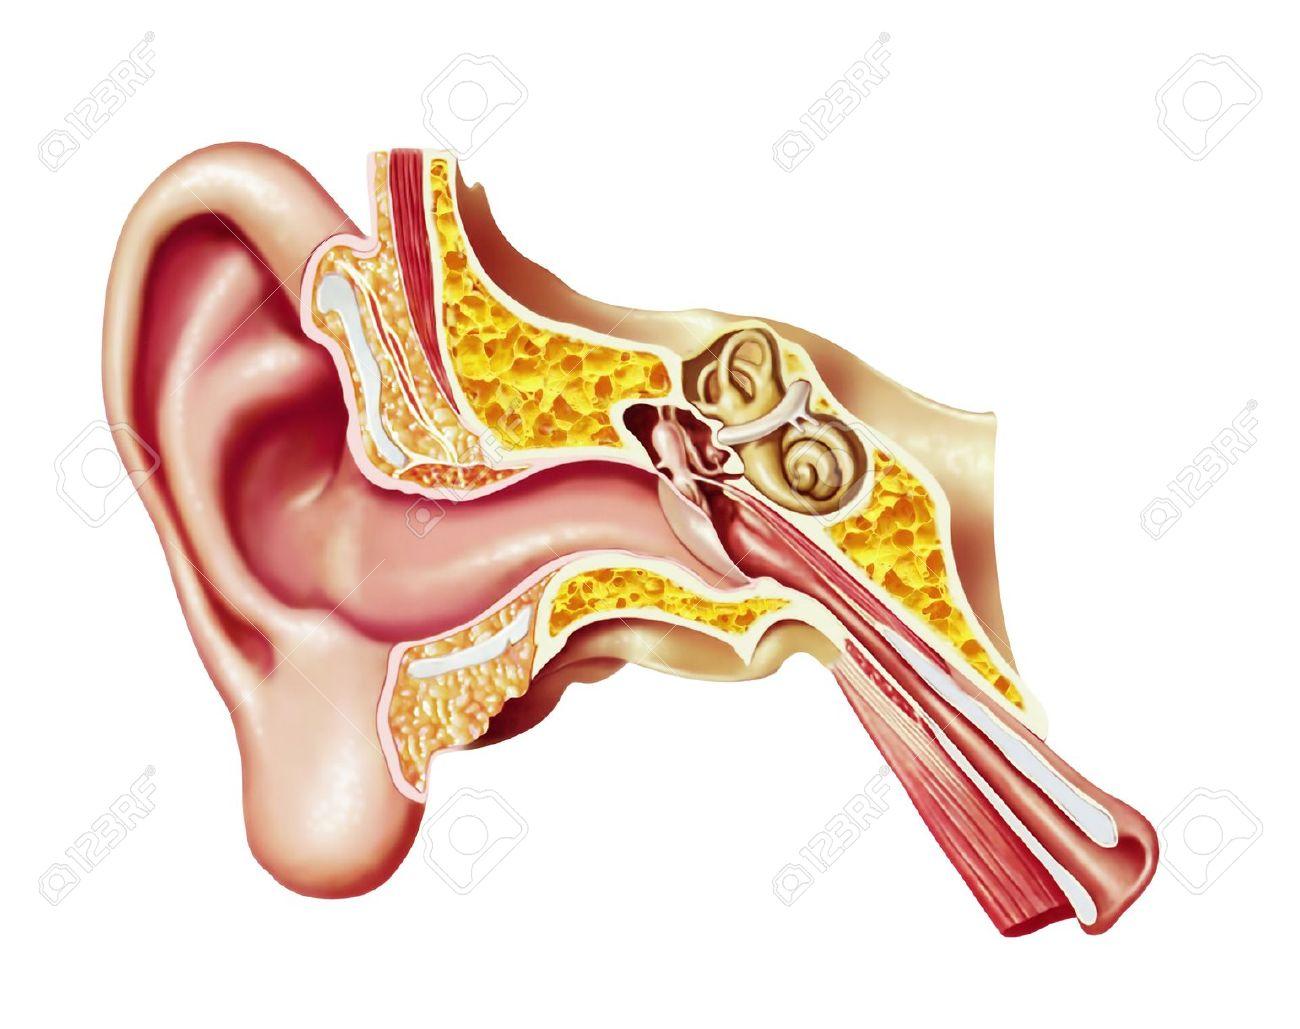 Ear canal clipart - Clipground